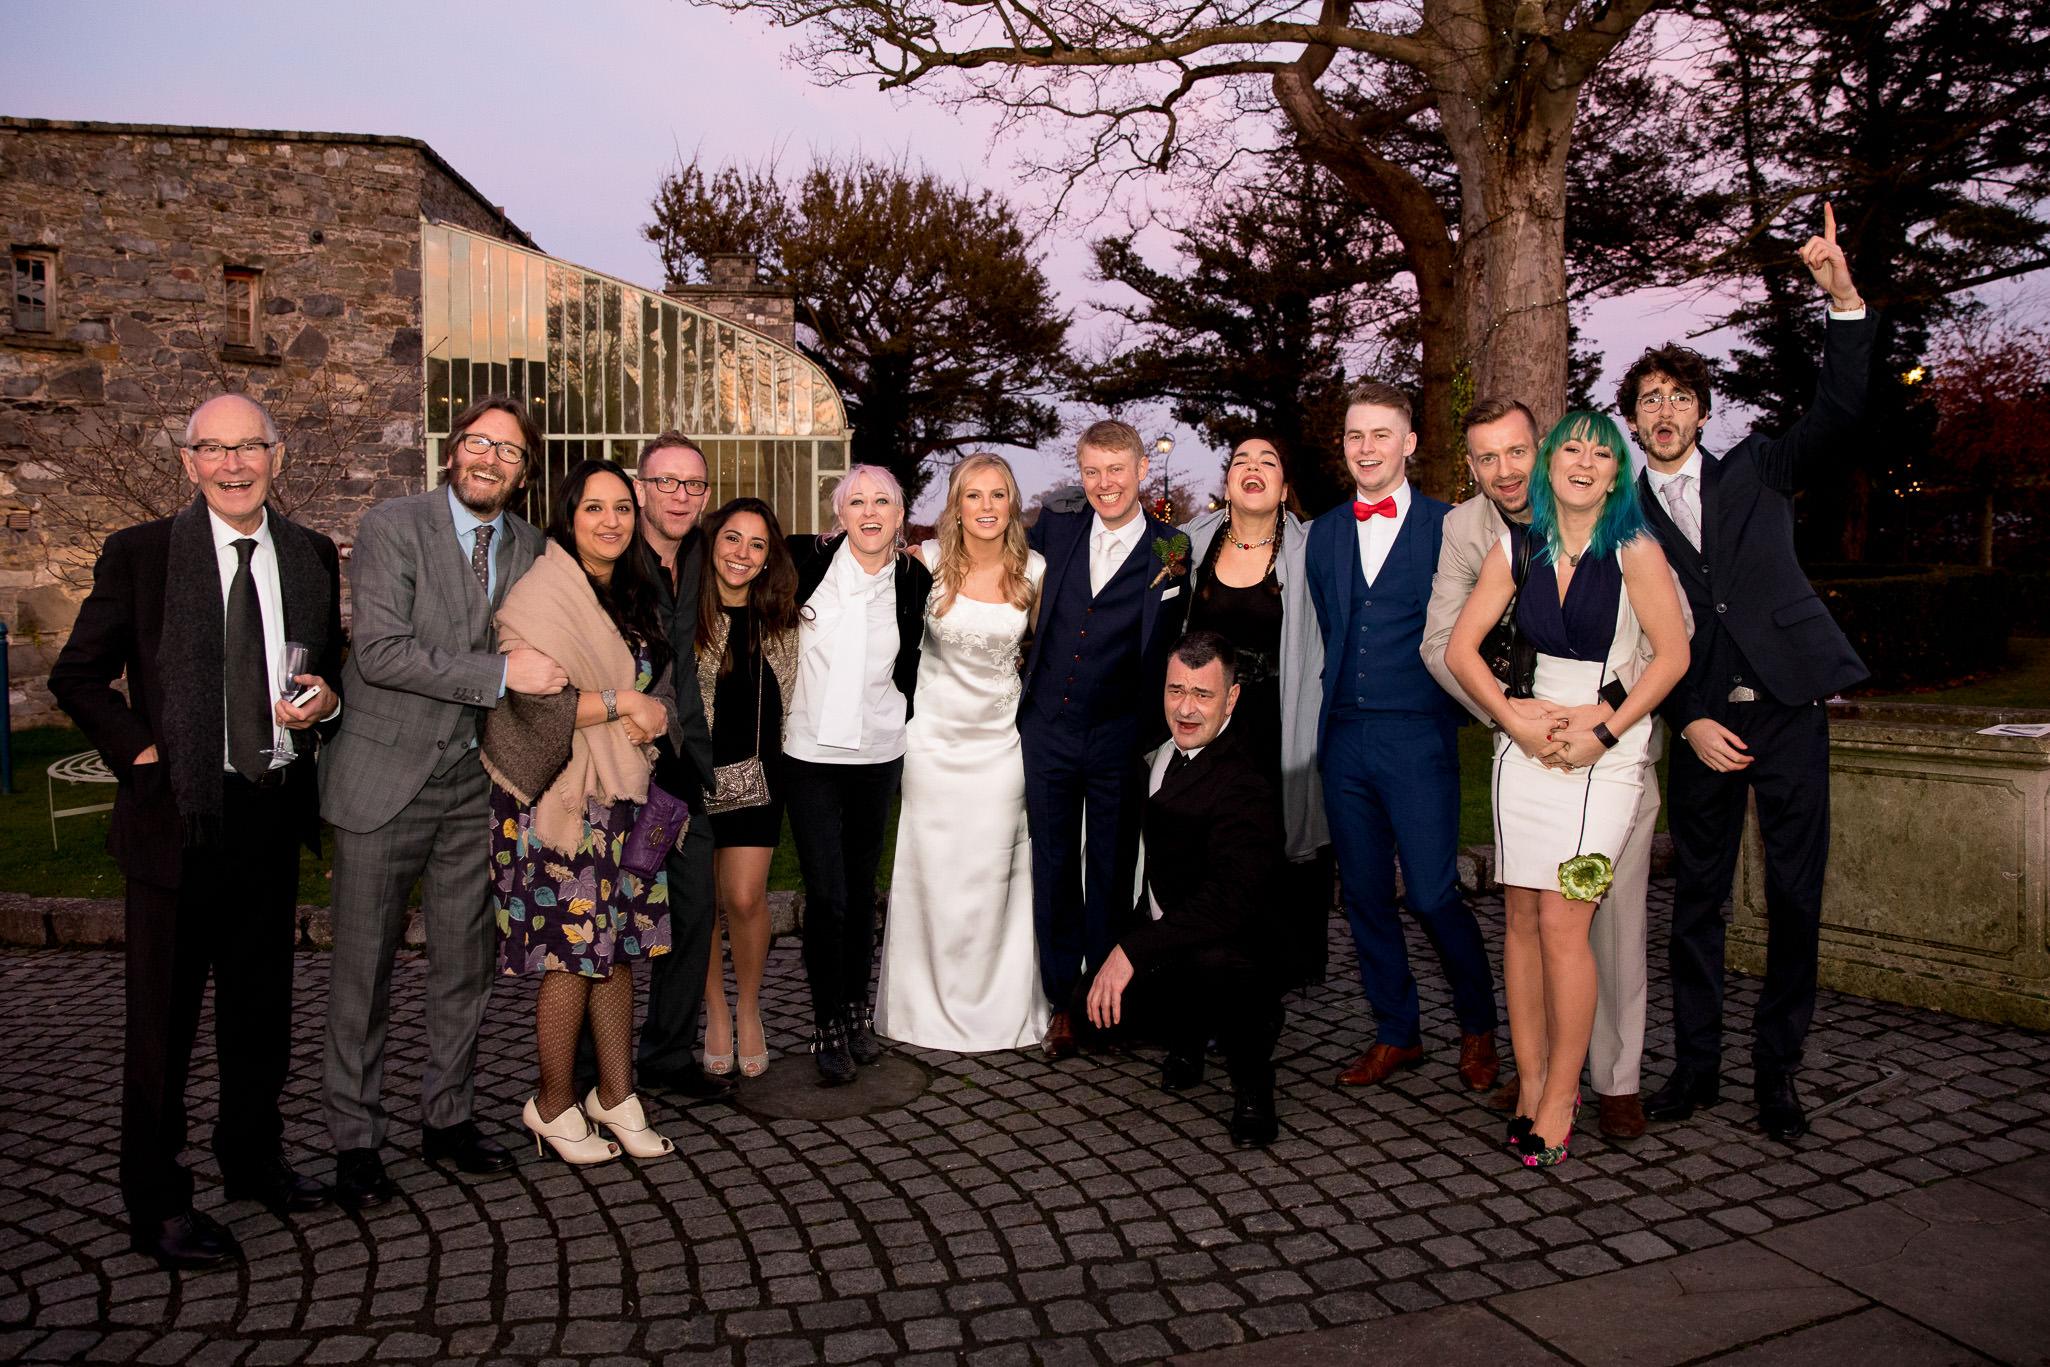 clairebyrnephotography-wedding-cliff-lyons-sparklers-christmas-clara-john-20.jpg